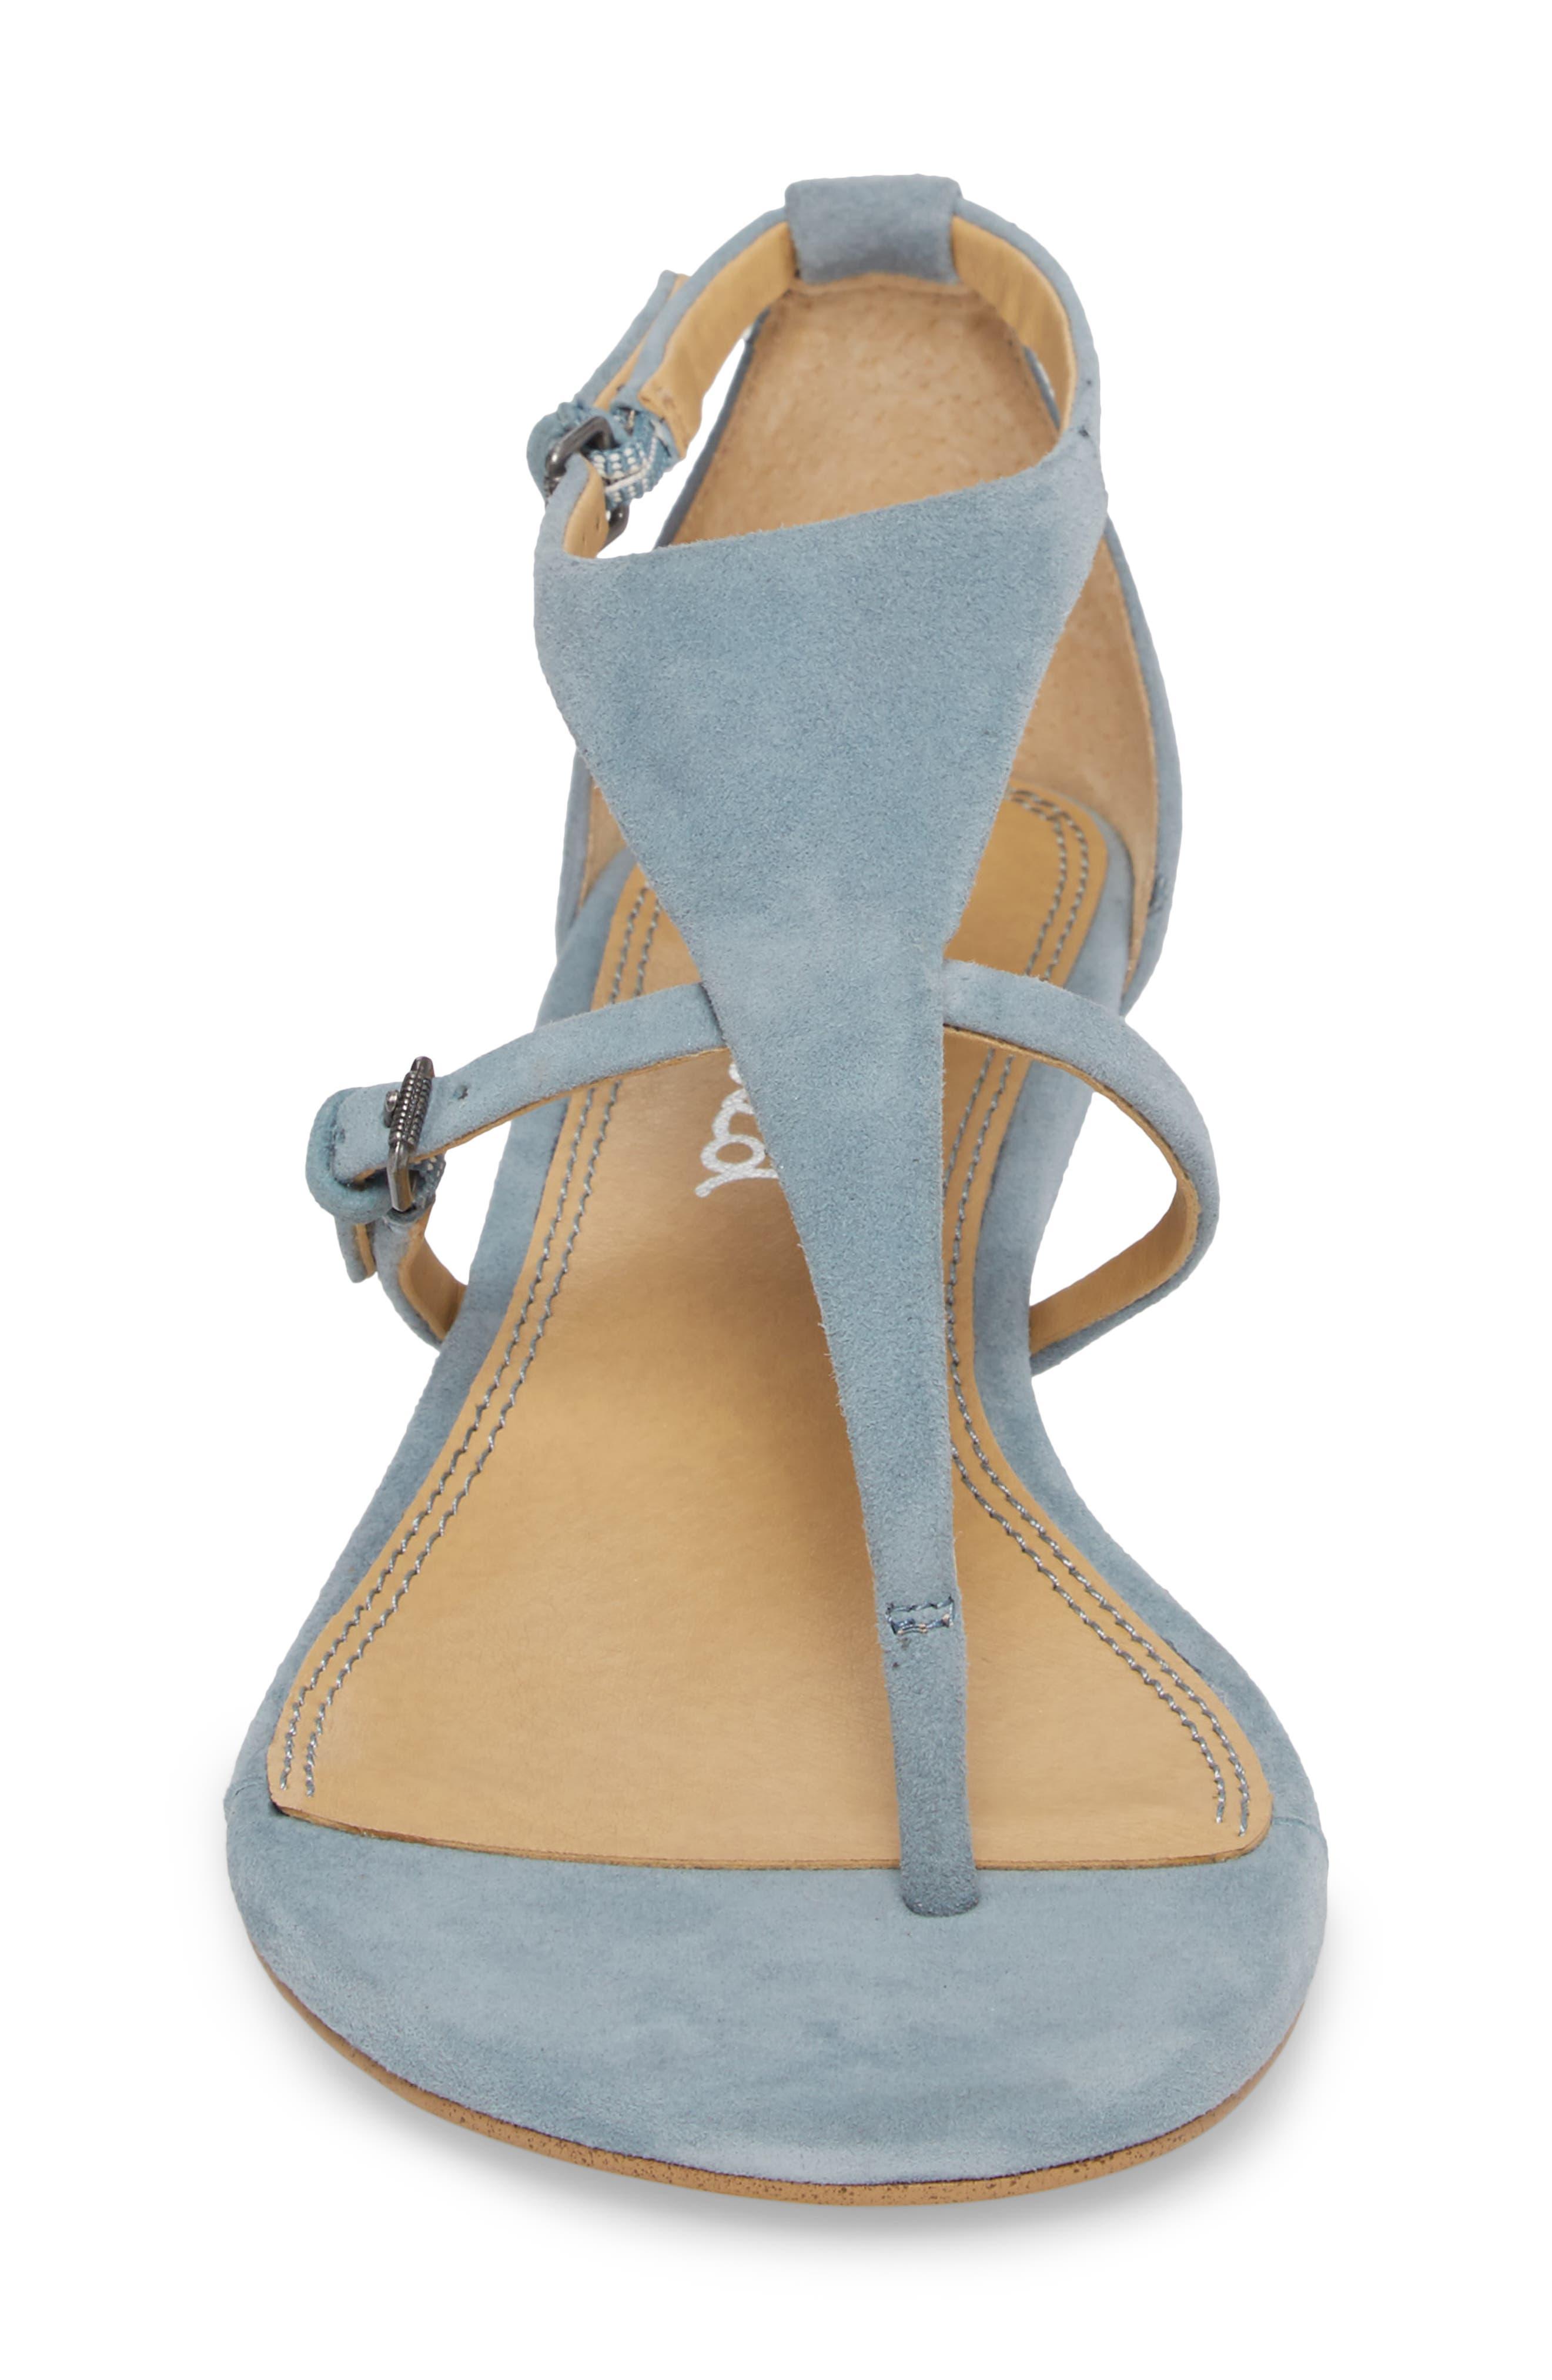 Brooklyn V-Strap Wedge Sandal,                             Alternate thumbnail 16, color,